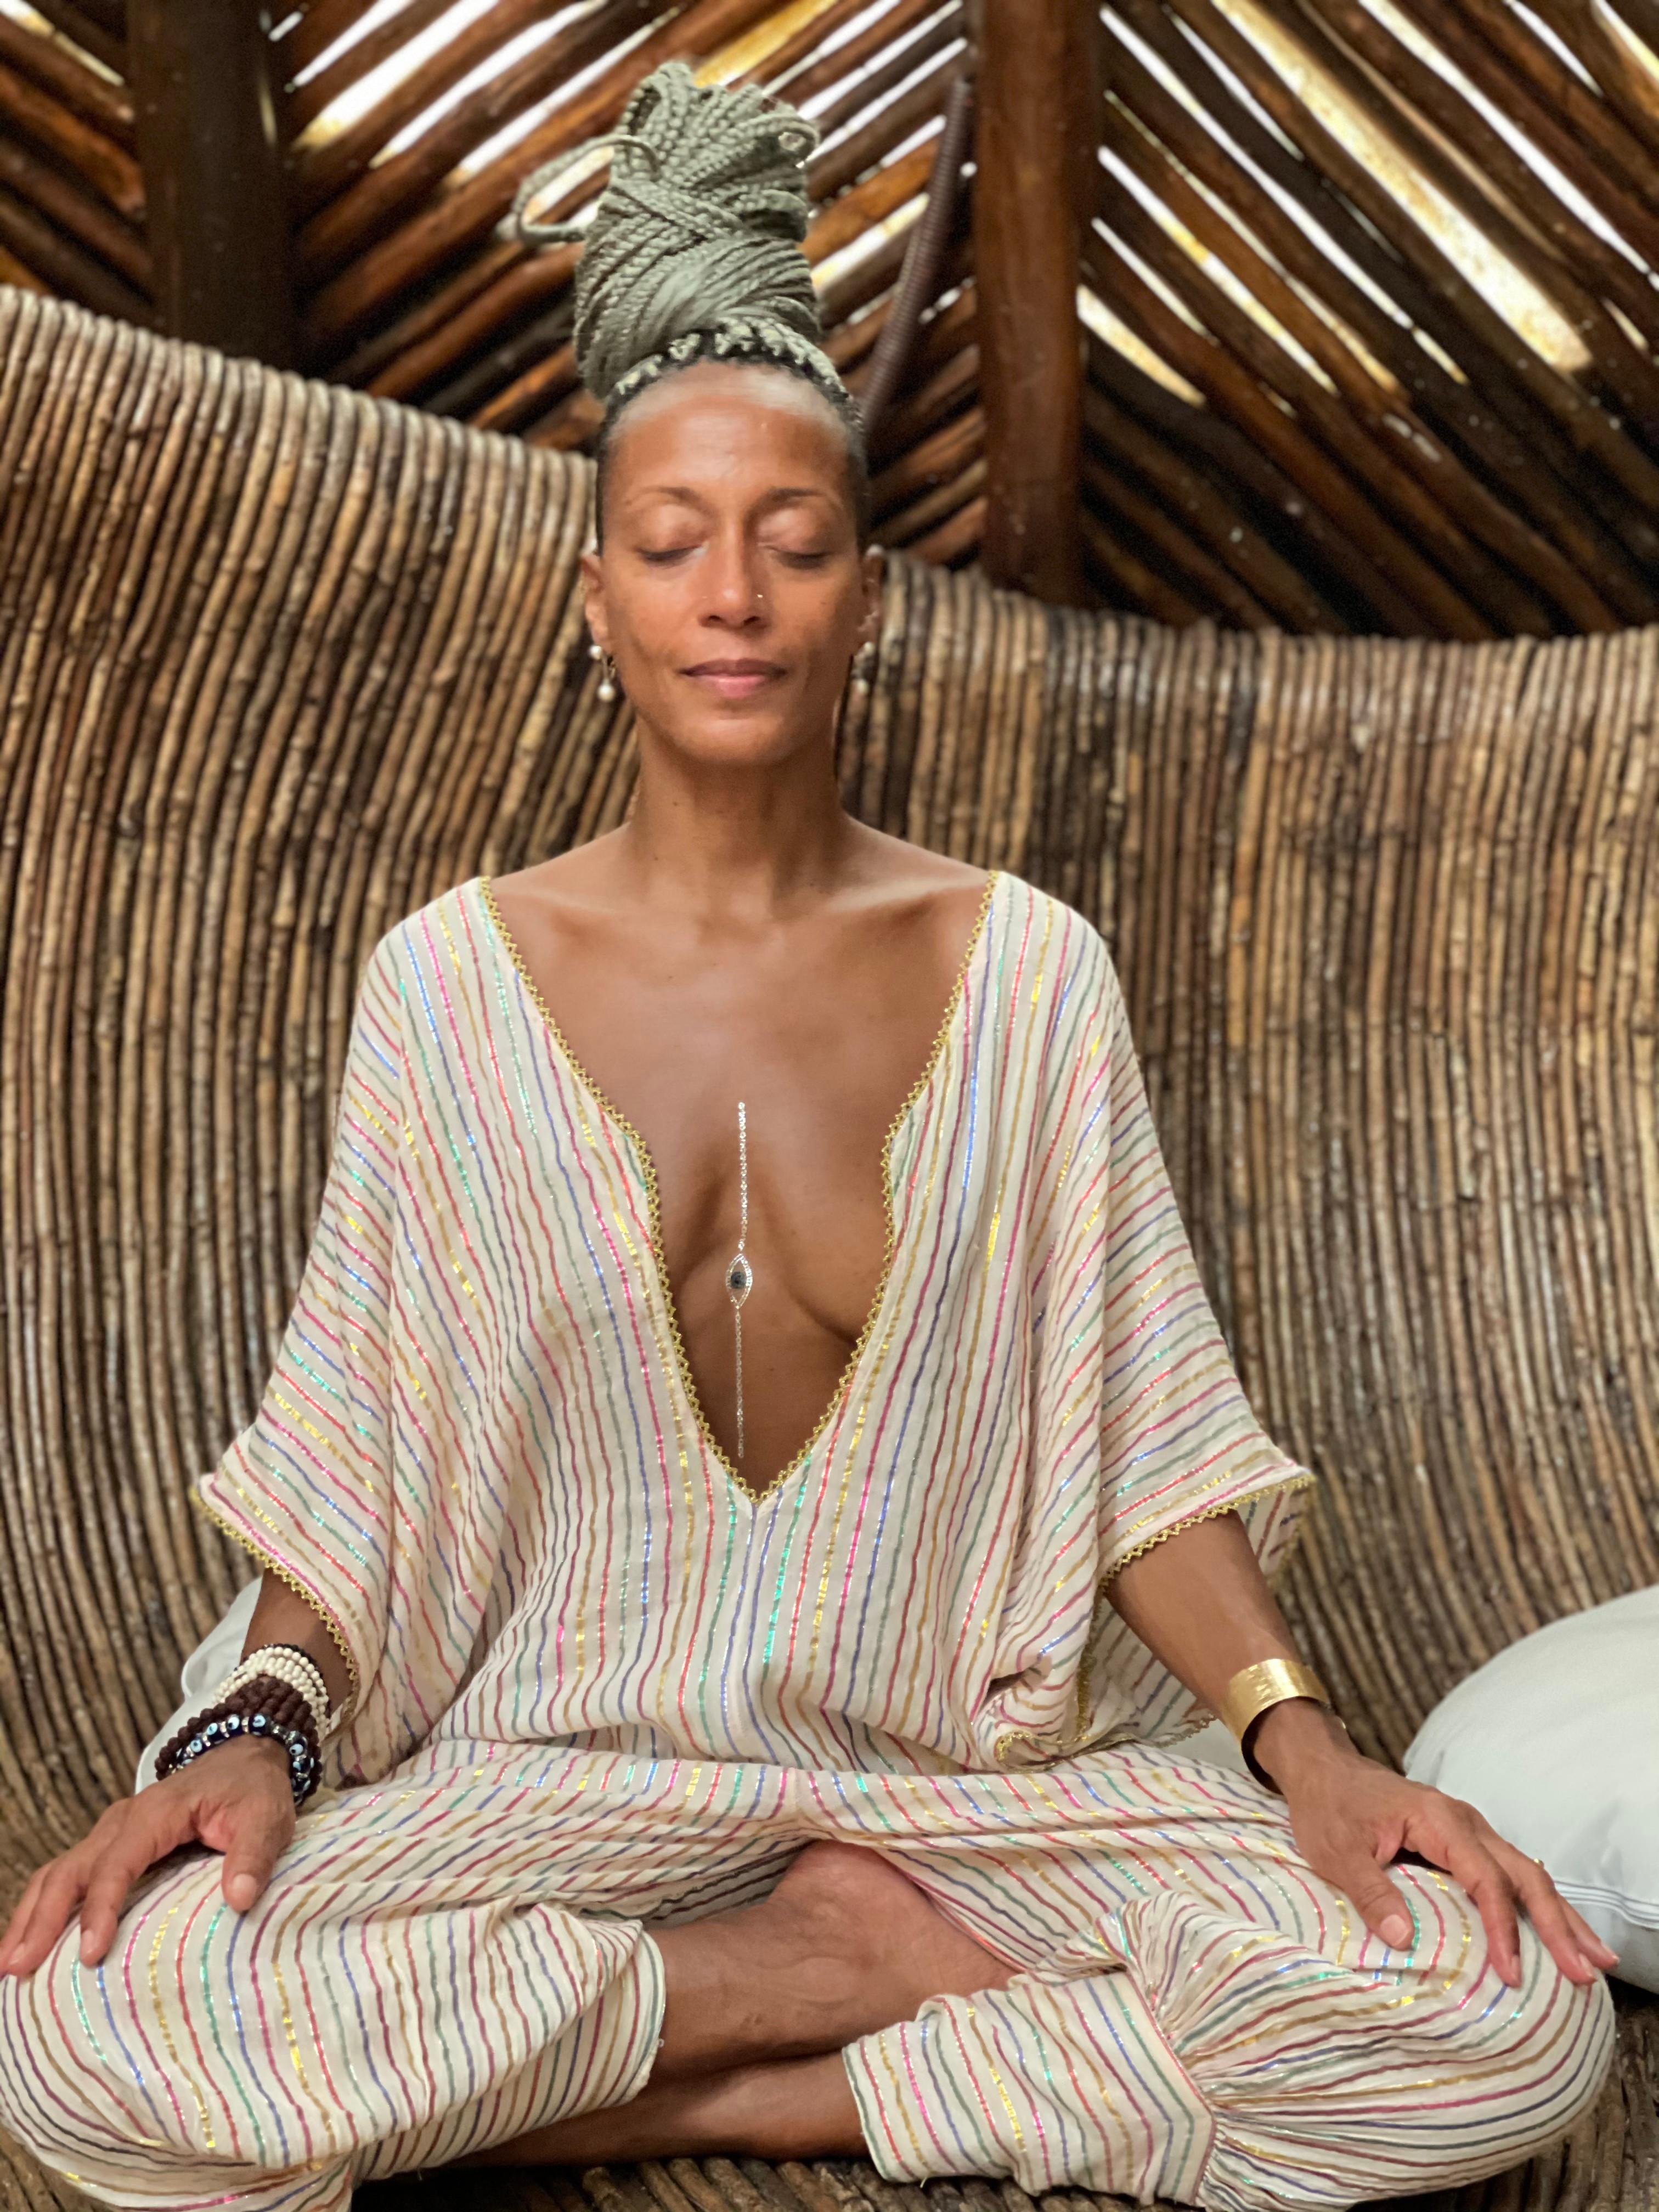 JOY IN JUNE 21-day meditation challenge